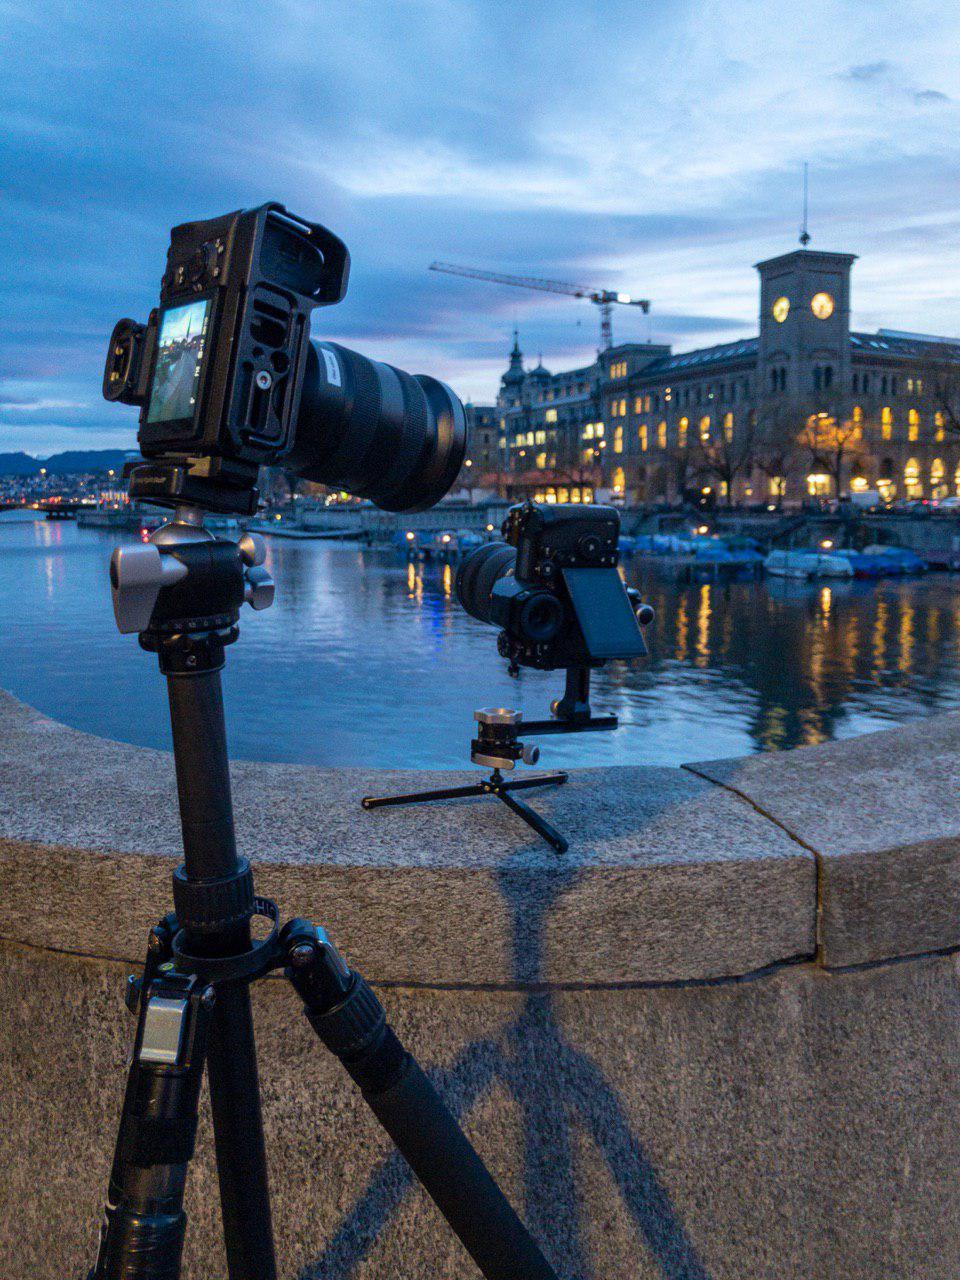 Panasonic Lumix S1R field test Zurich Switzerland swivel screen.jpg